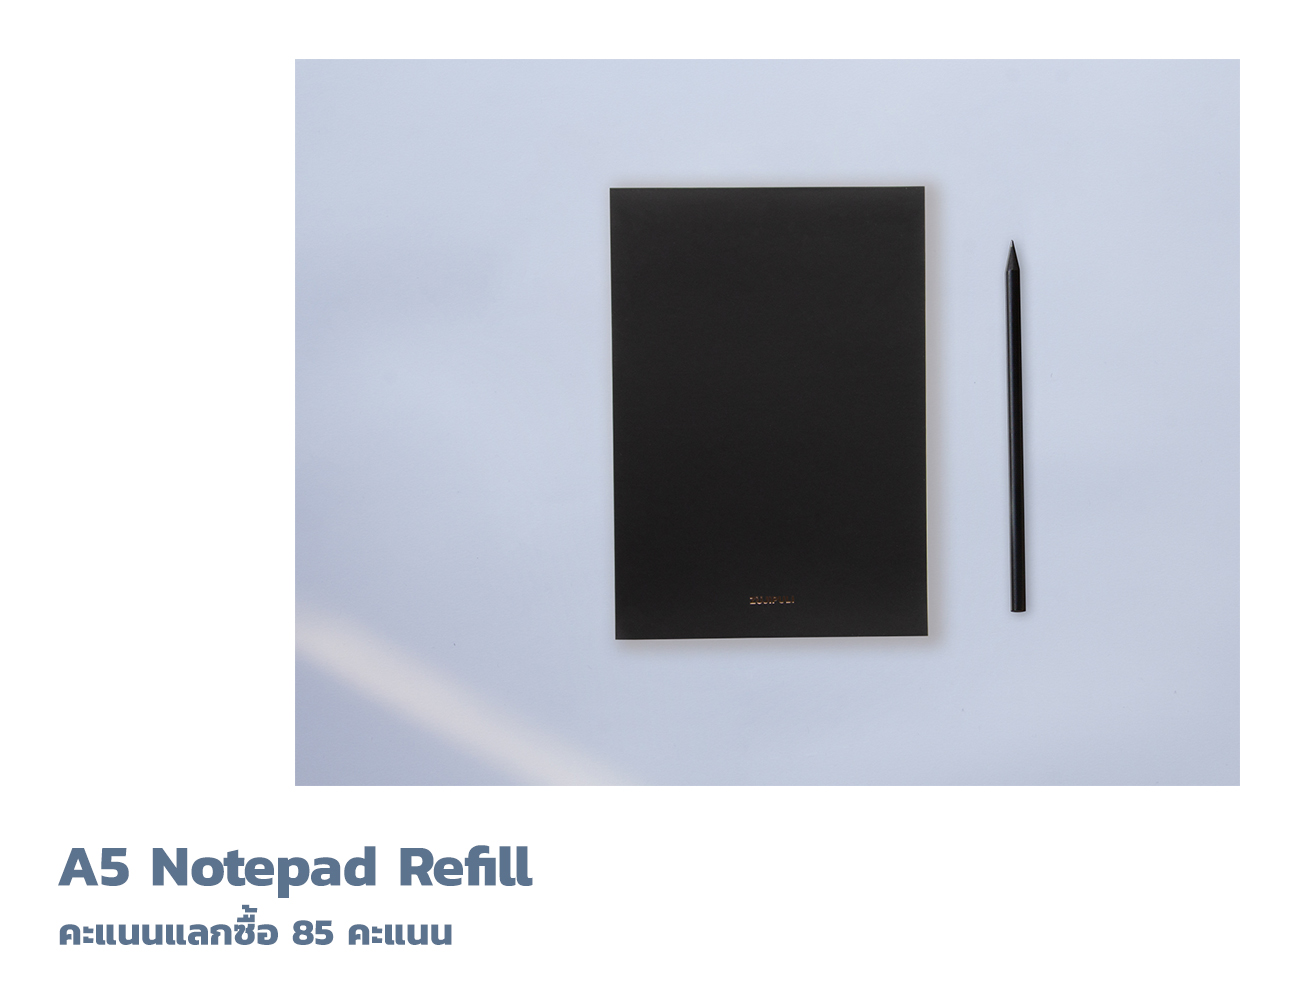 A5 Notepad Refill